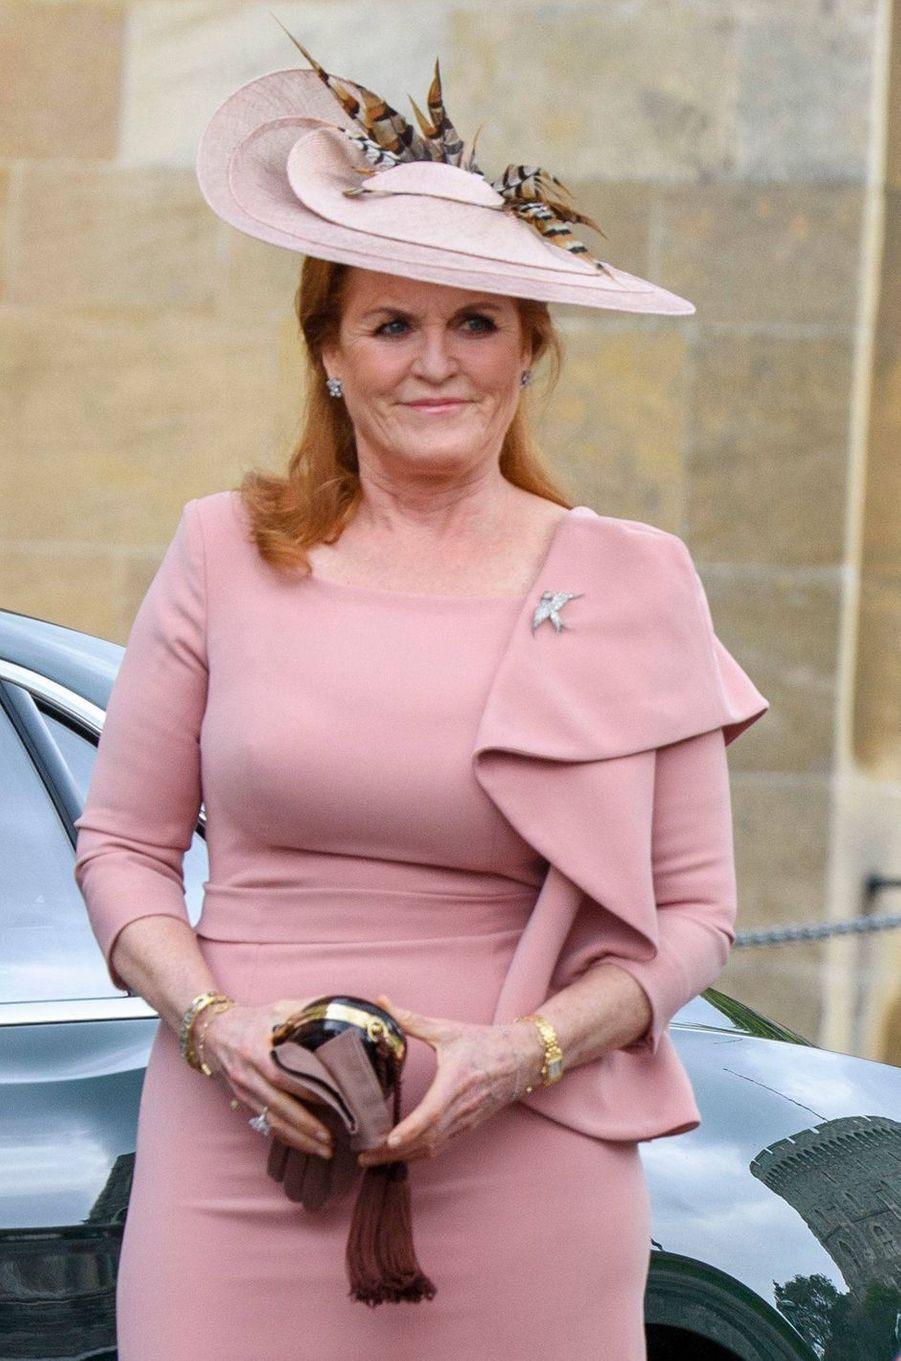 Sarah Ferguson, duchesse d'York, à Windsor le 18 mai 2019